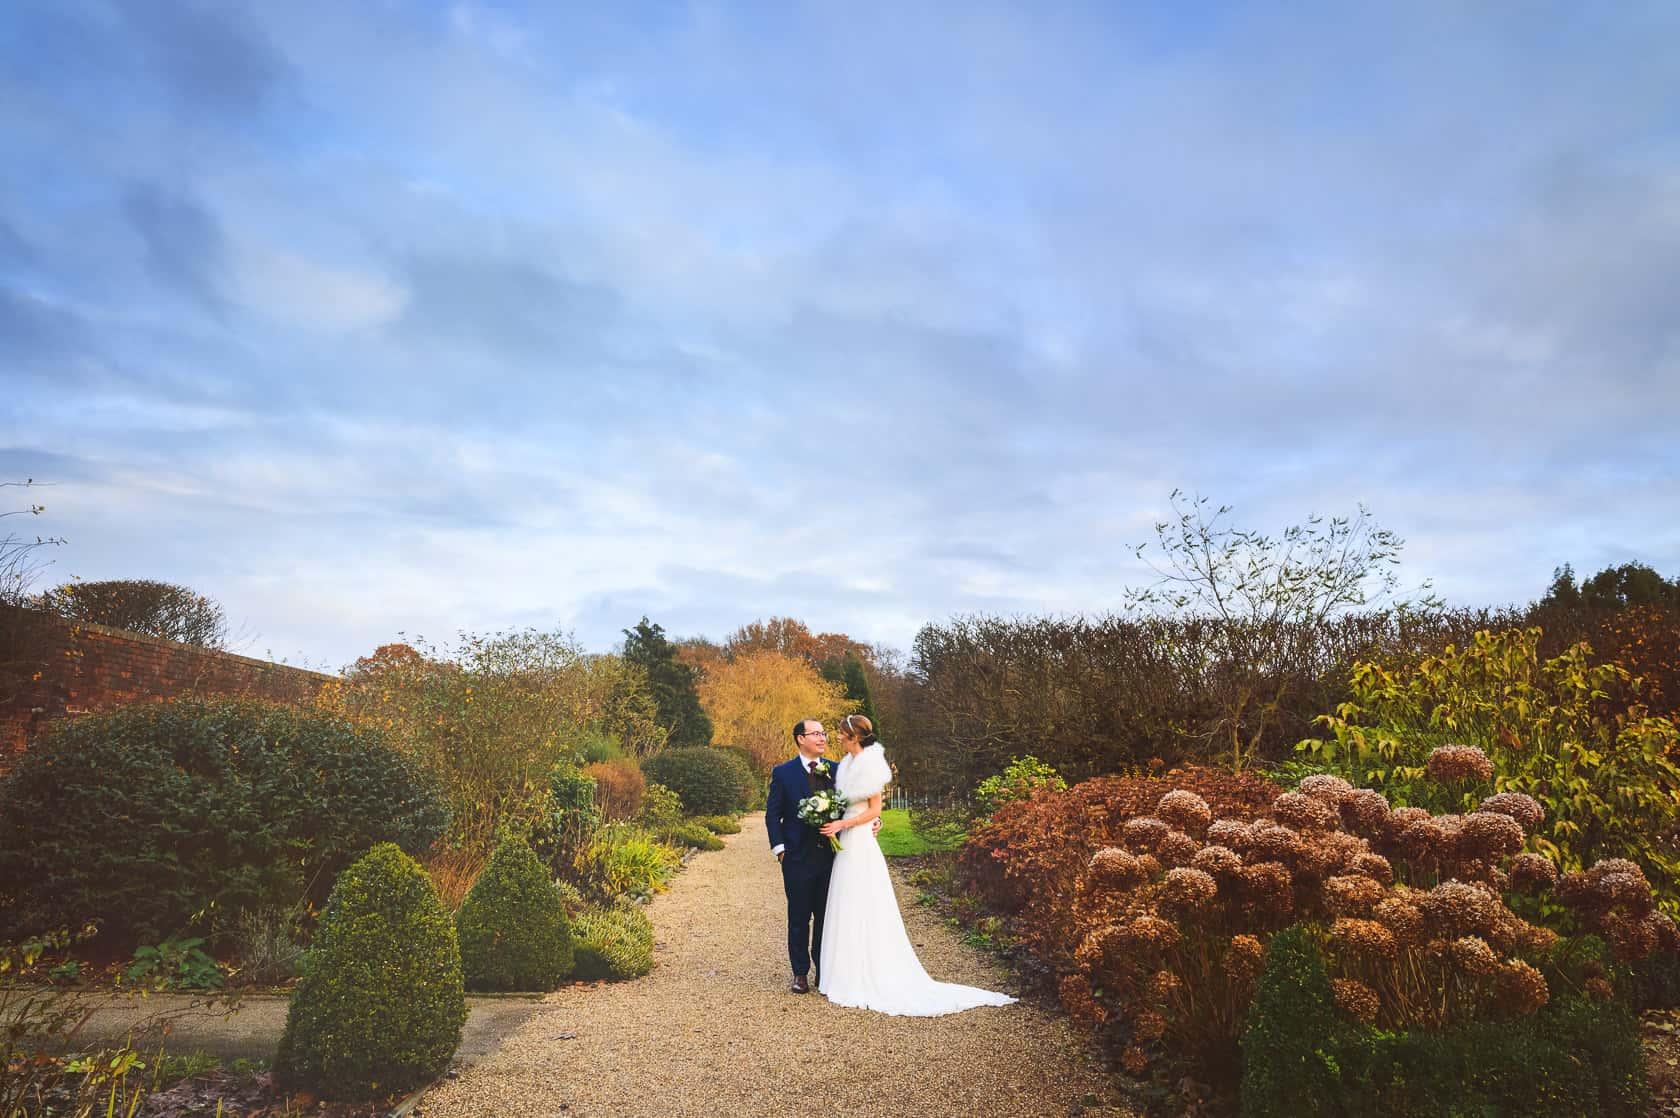 Best_Wedding_Photography_2019_Wedding-Photographer-Essex_031